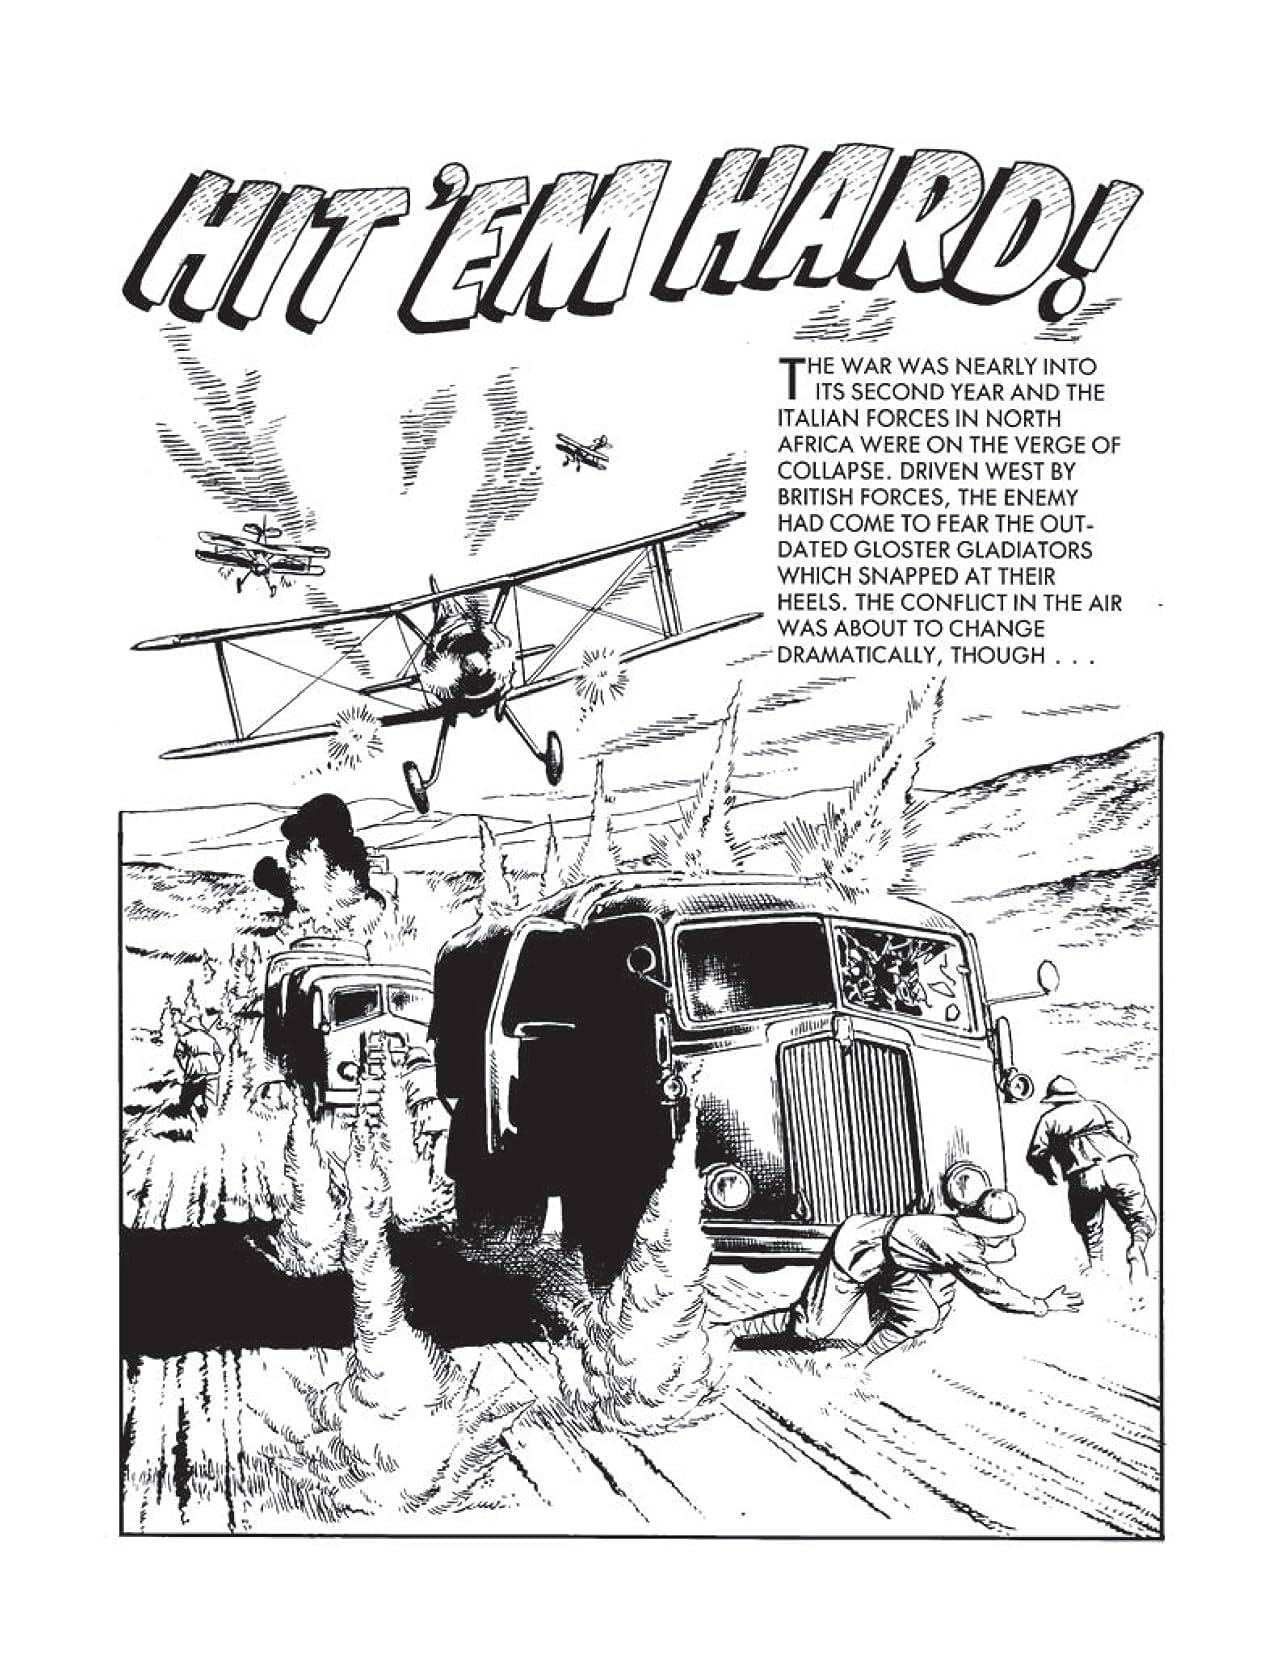 Commando #4474: Hit 'Em Hard